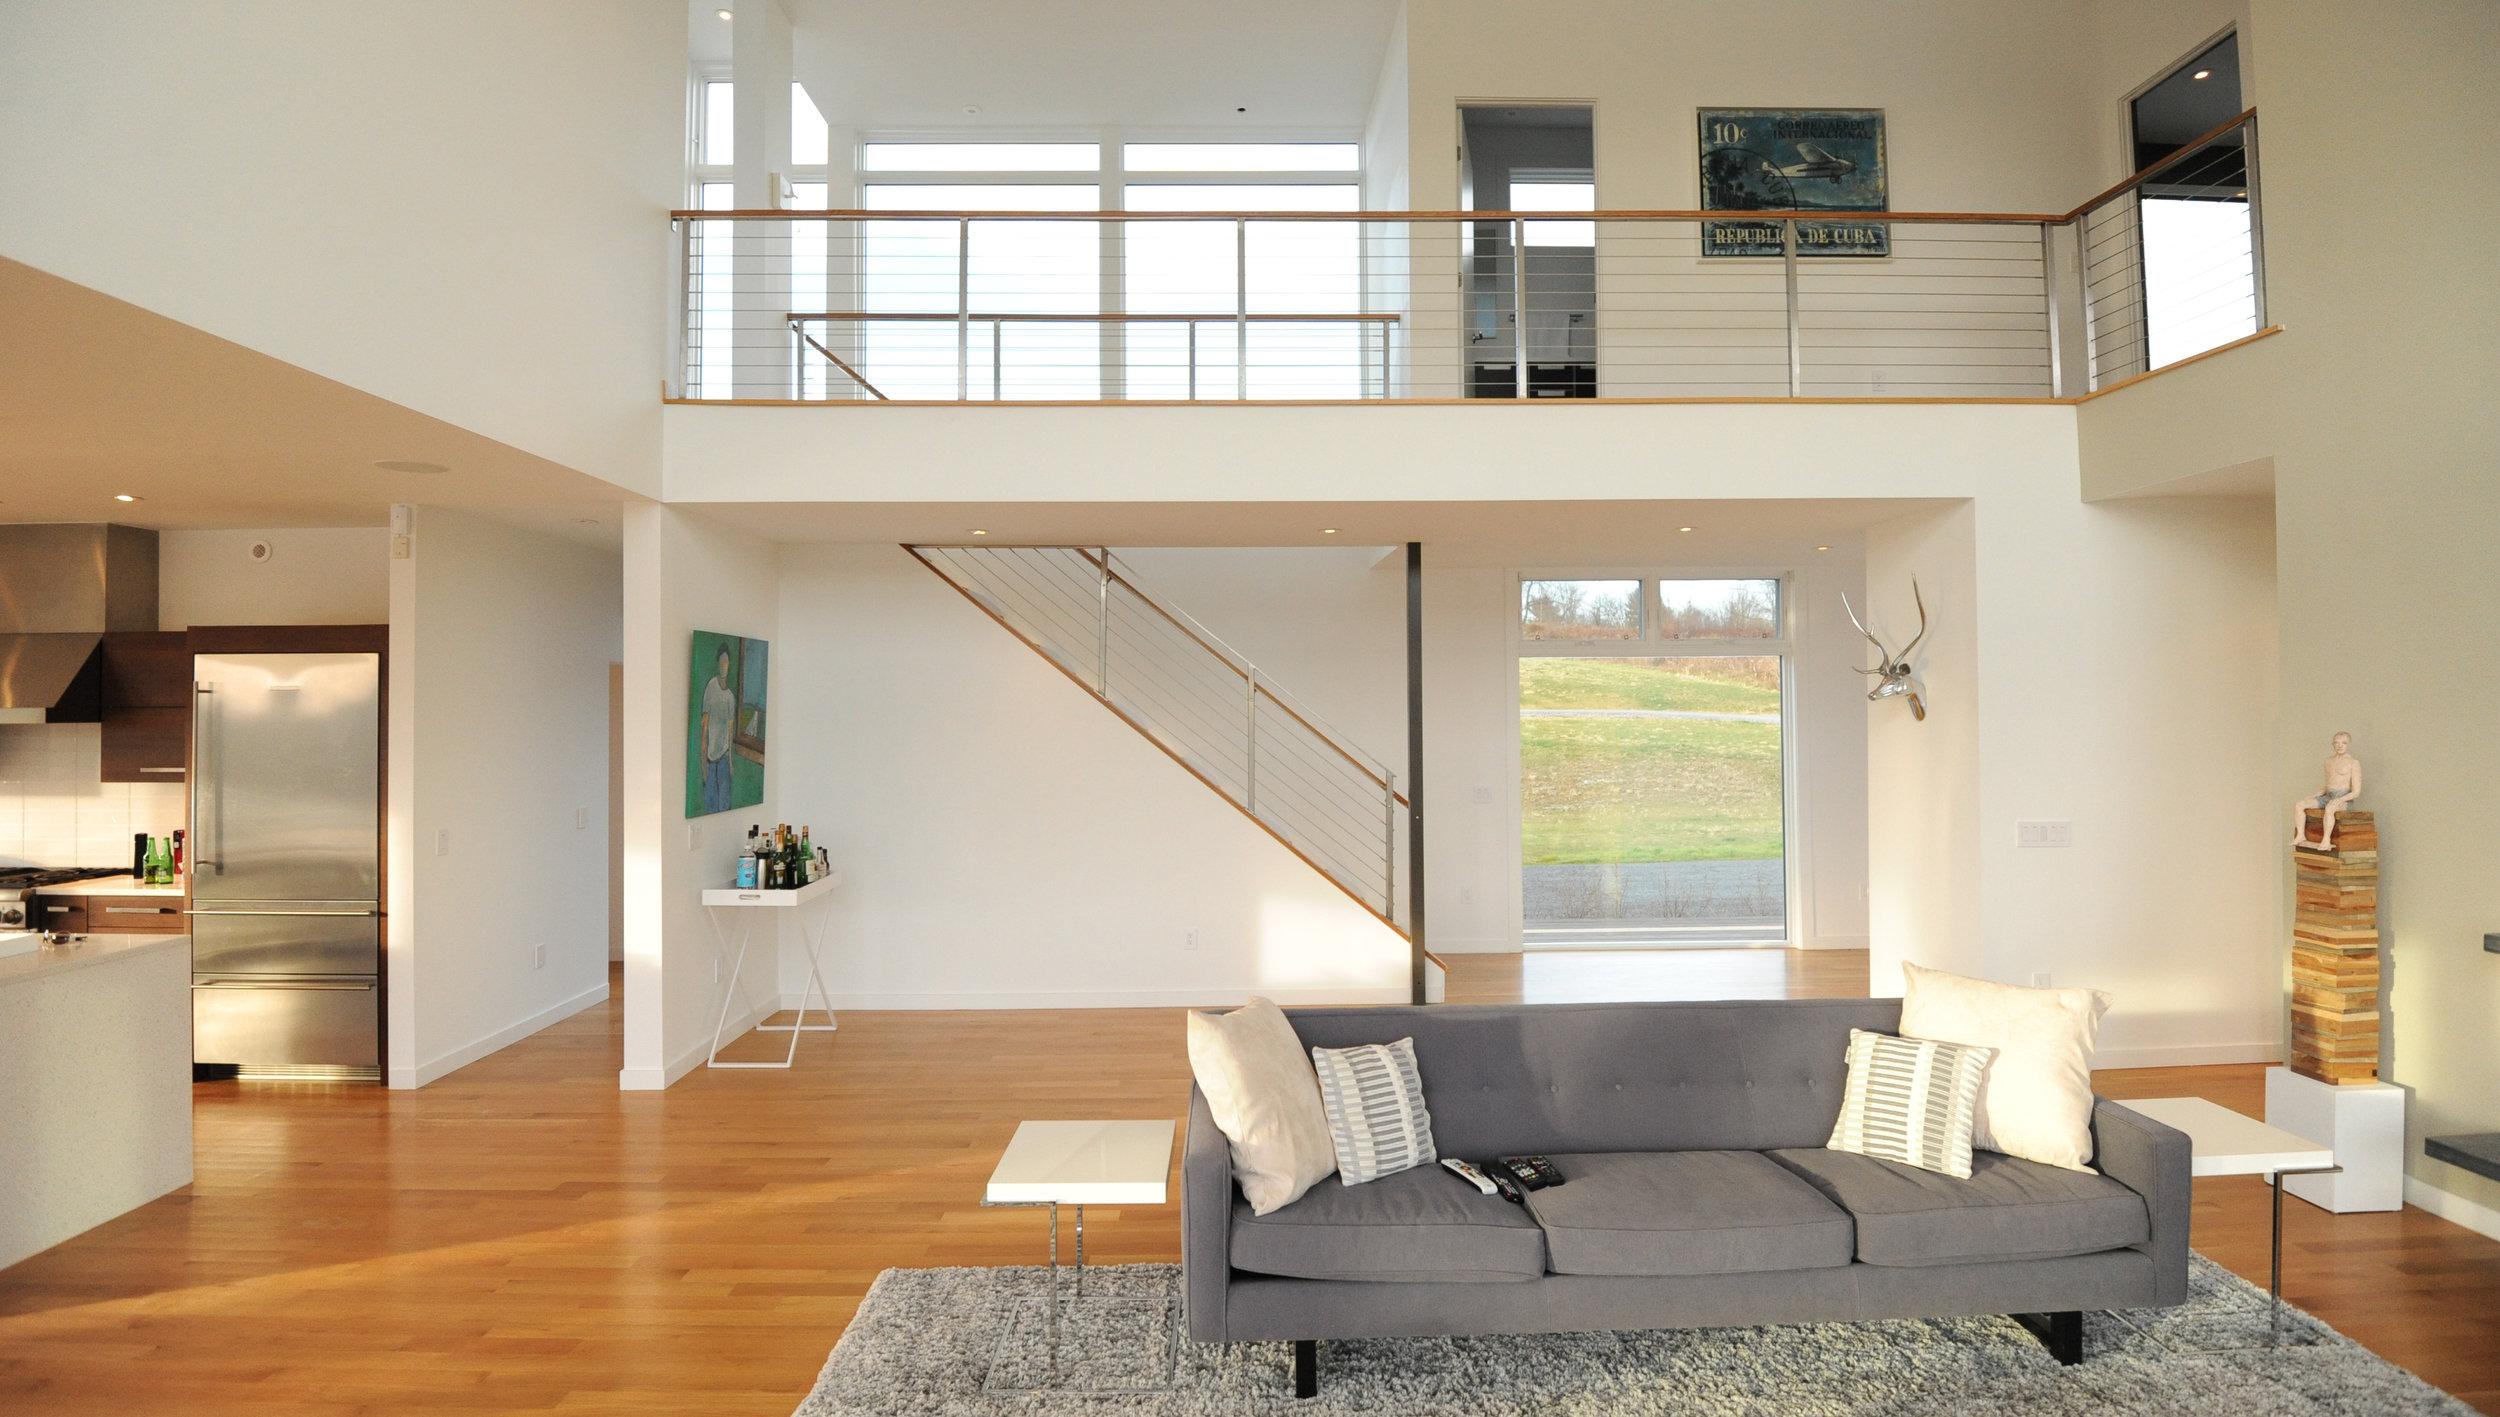 turkel_modern_design_prefab_home_writers_retreat_living_space.jpg